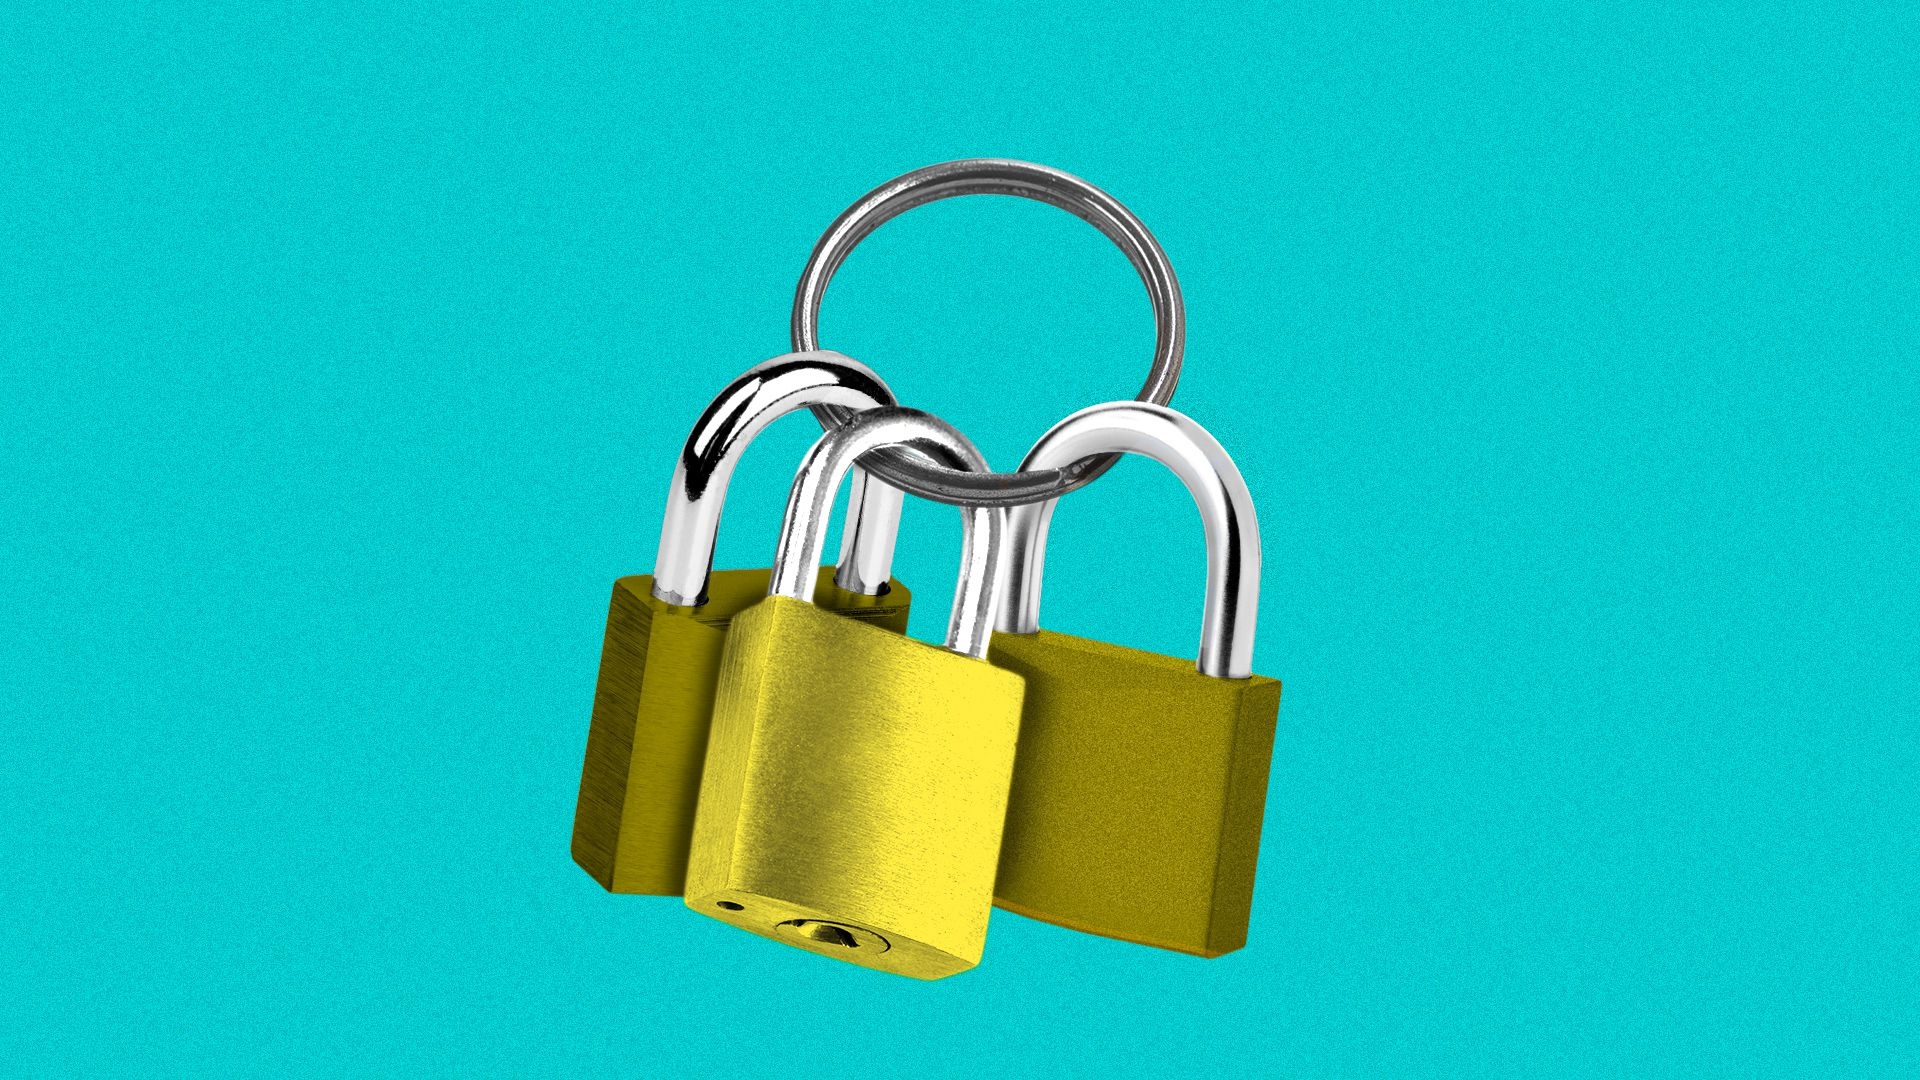 Illustration of padlocks tied together with a keyring